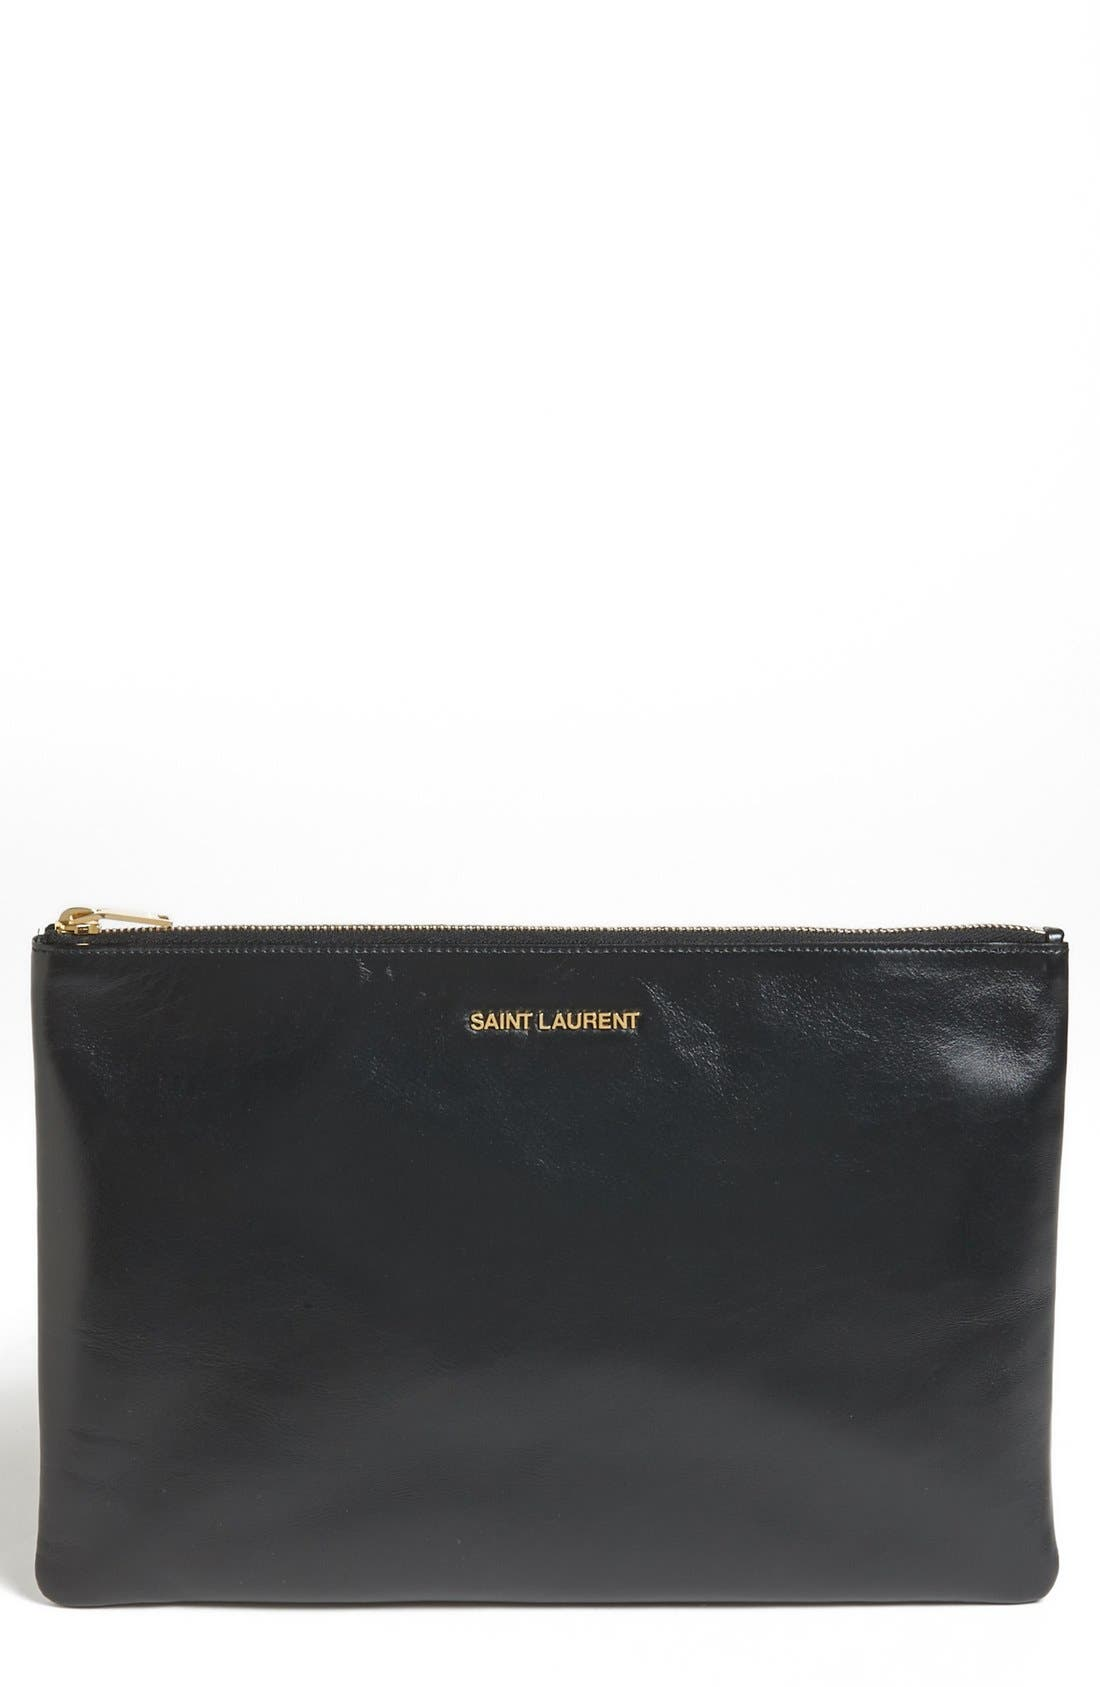 Alternate Image 1 Selected - Saint Laurent Leather Clutch